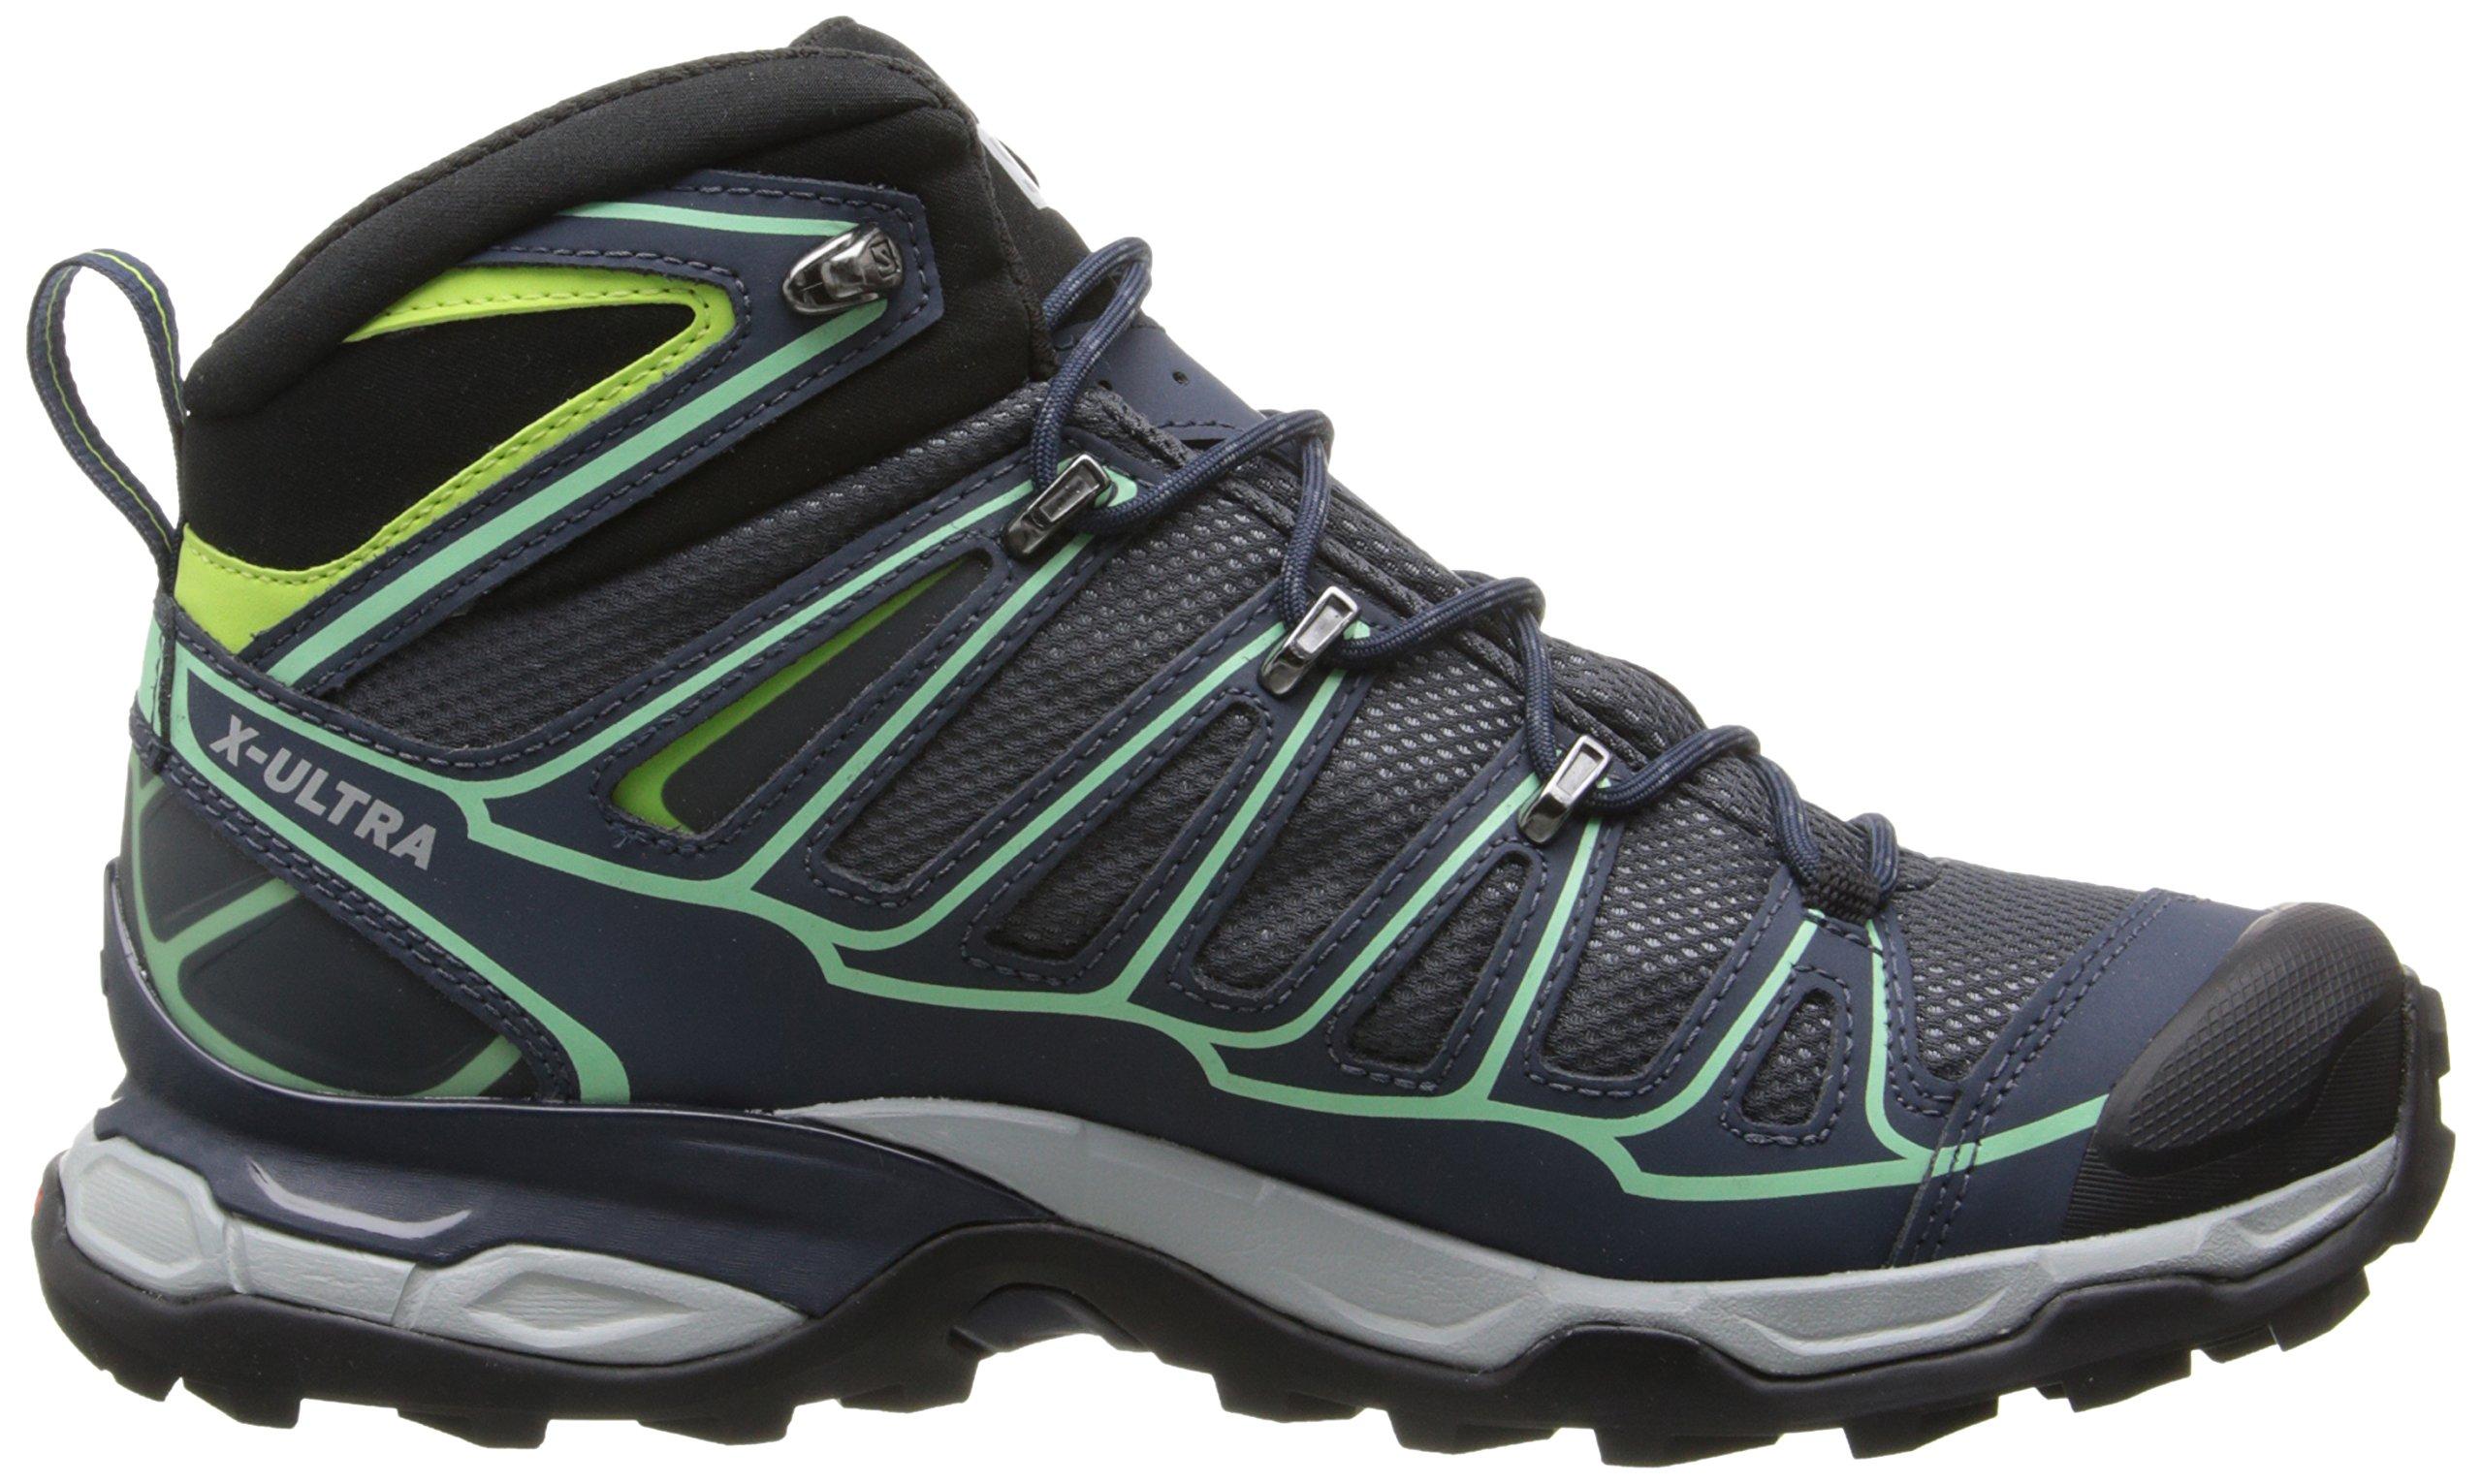 Salomon Women's X Ultra Mid 2 GTX Hiking Shoe, Grey Denim/Deep Blue/Lucite Green, 9 M US by Salomon (Image #7)